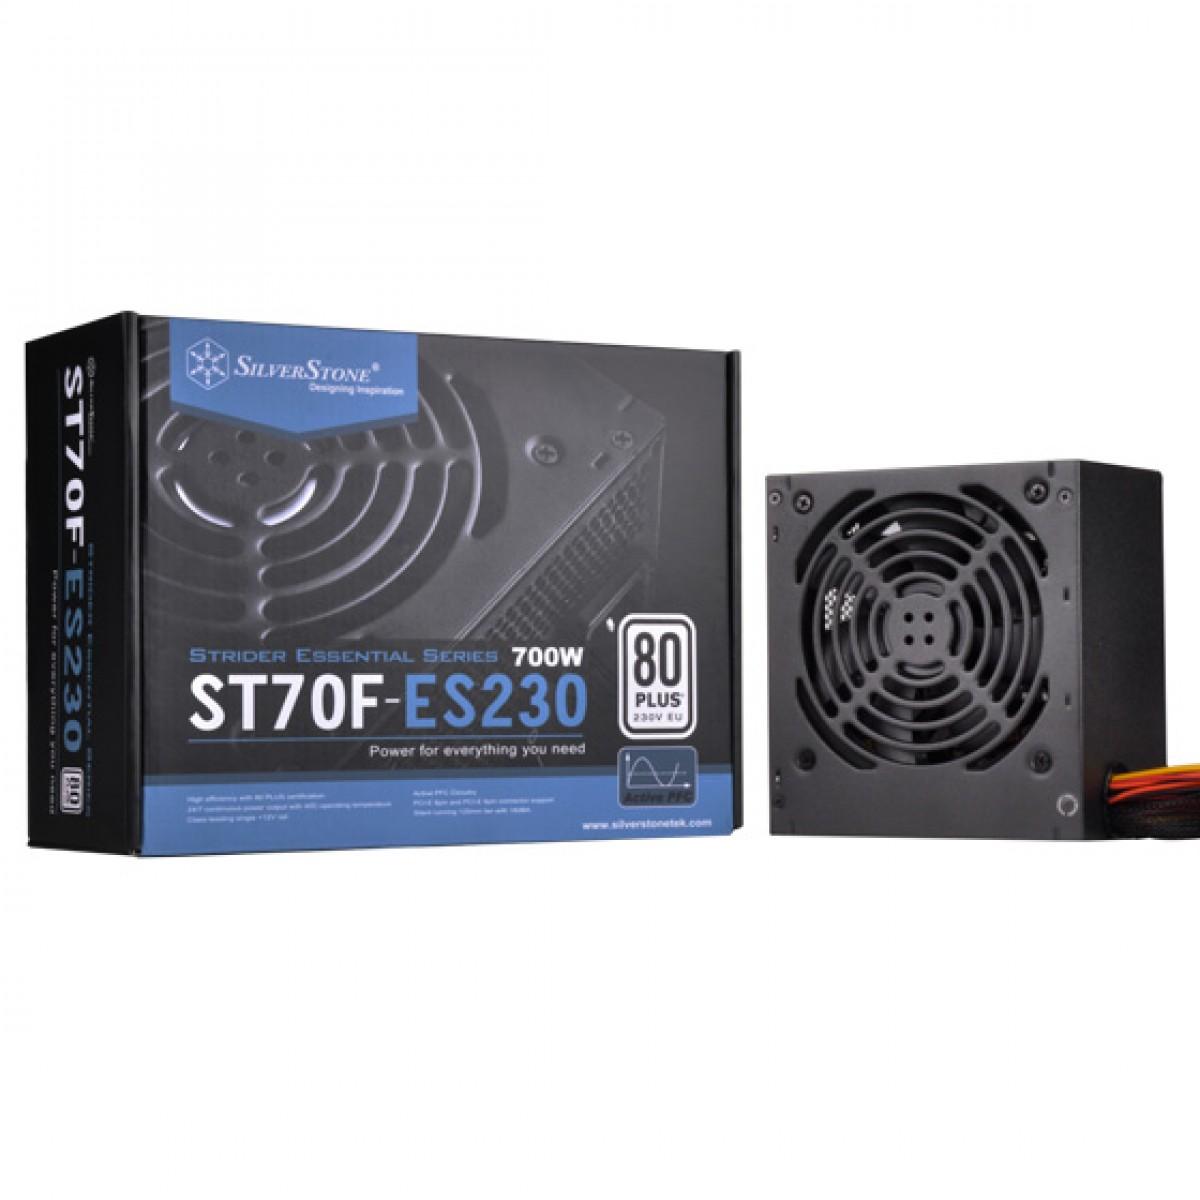 Fonte SilverStone SST-ST70F-ES230, 700W, 80 Plus, PFC Ativo, SST-ST70F-ES230 (APENAS 220V)